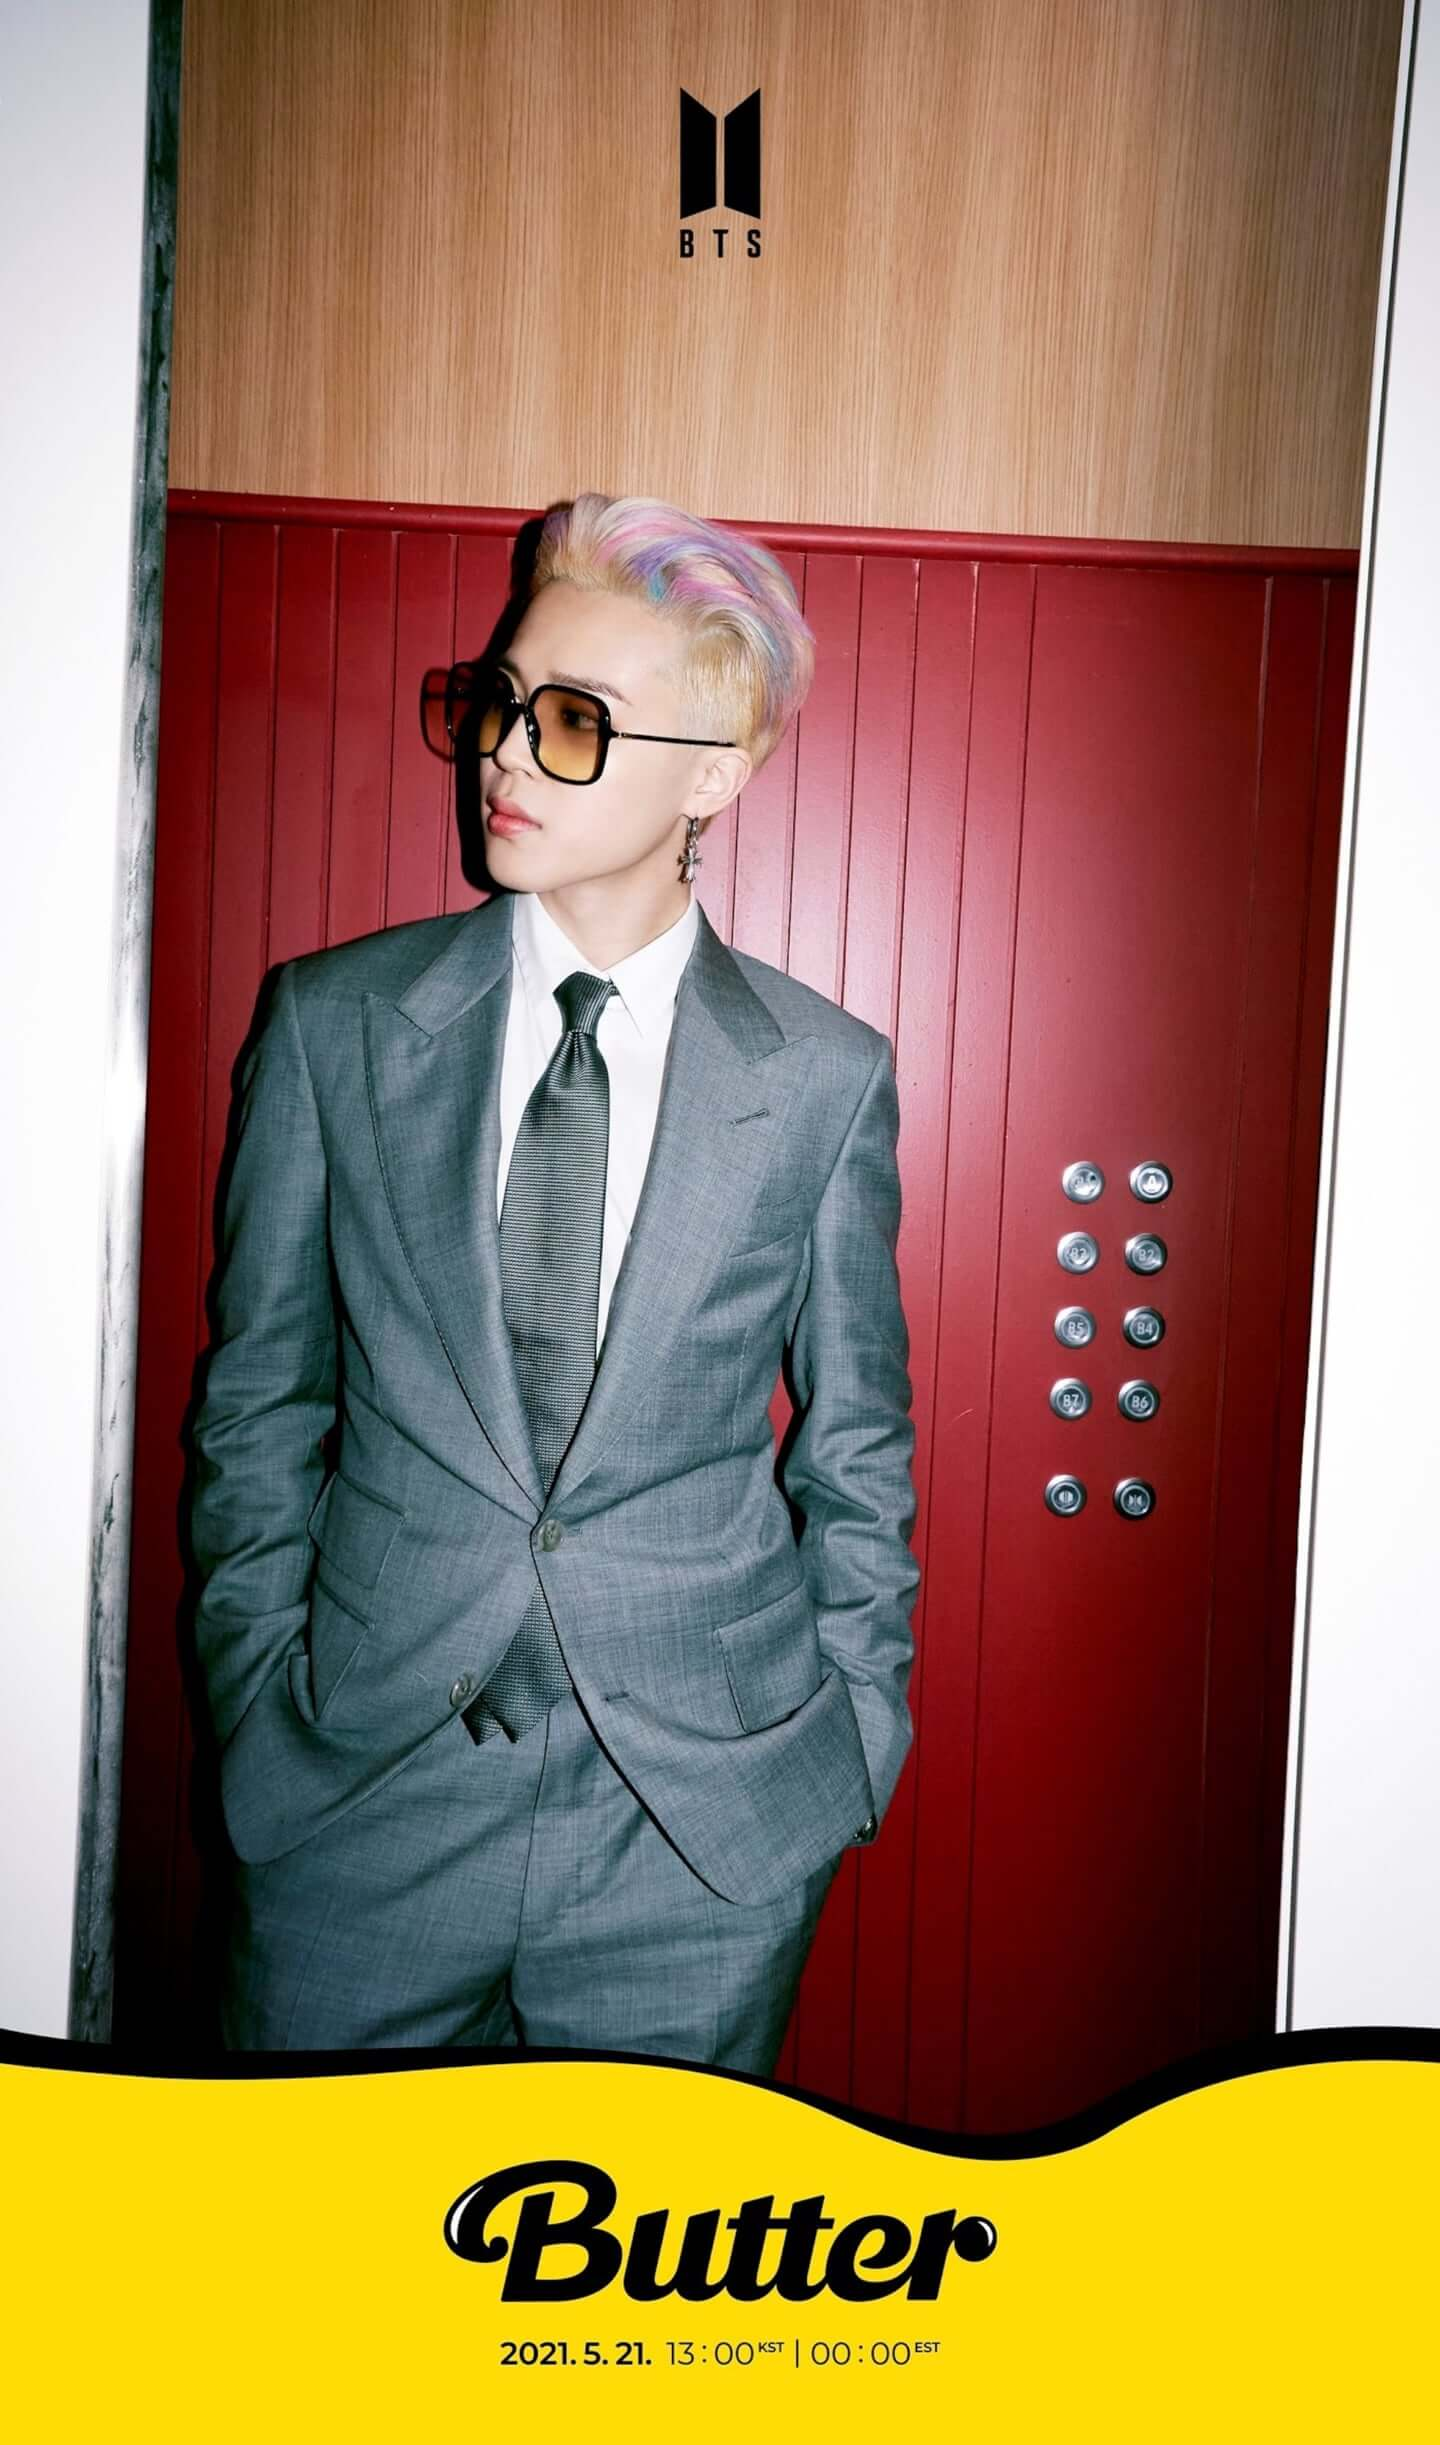 "BTS、待望の新曲""Butter""を5月21日に全世界同時リリース!メンバー別ティーザーフォトが公開"